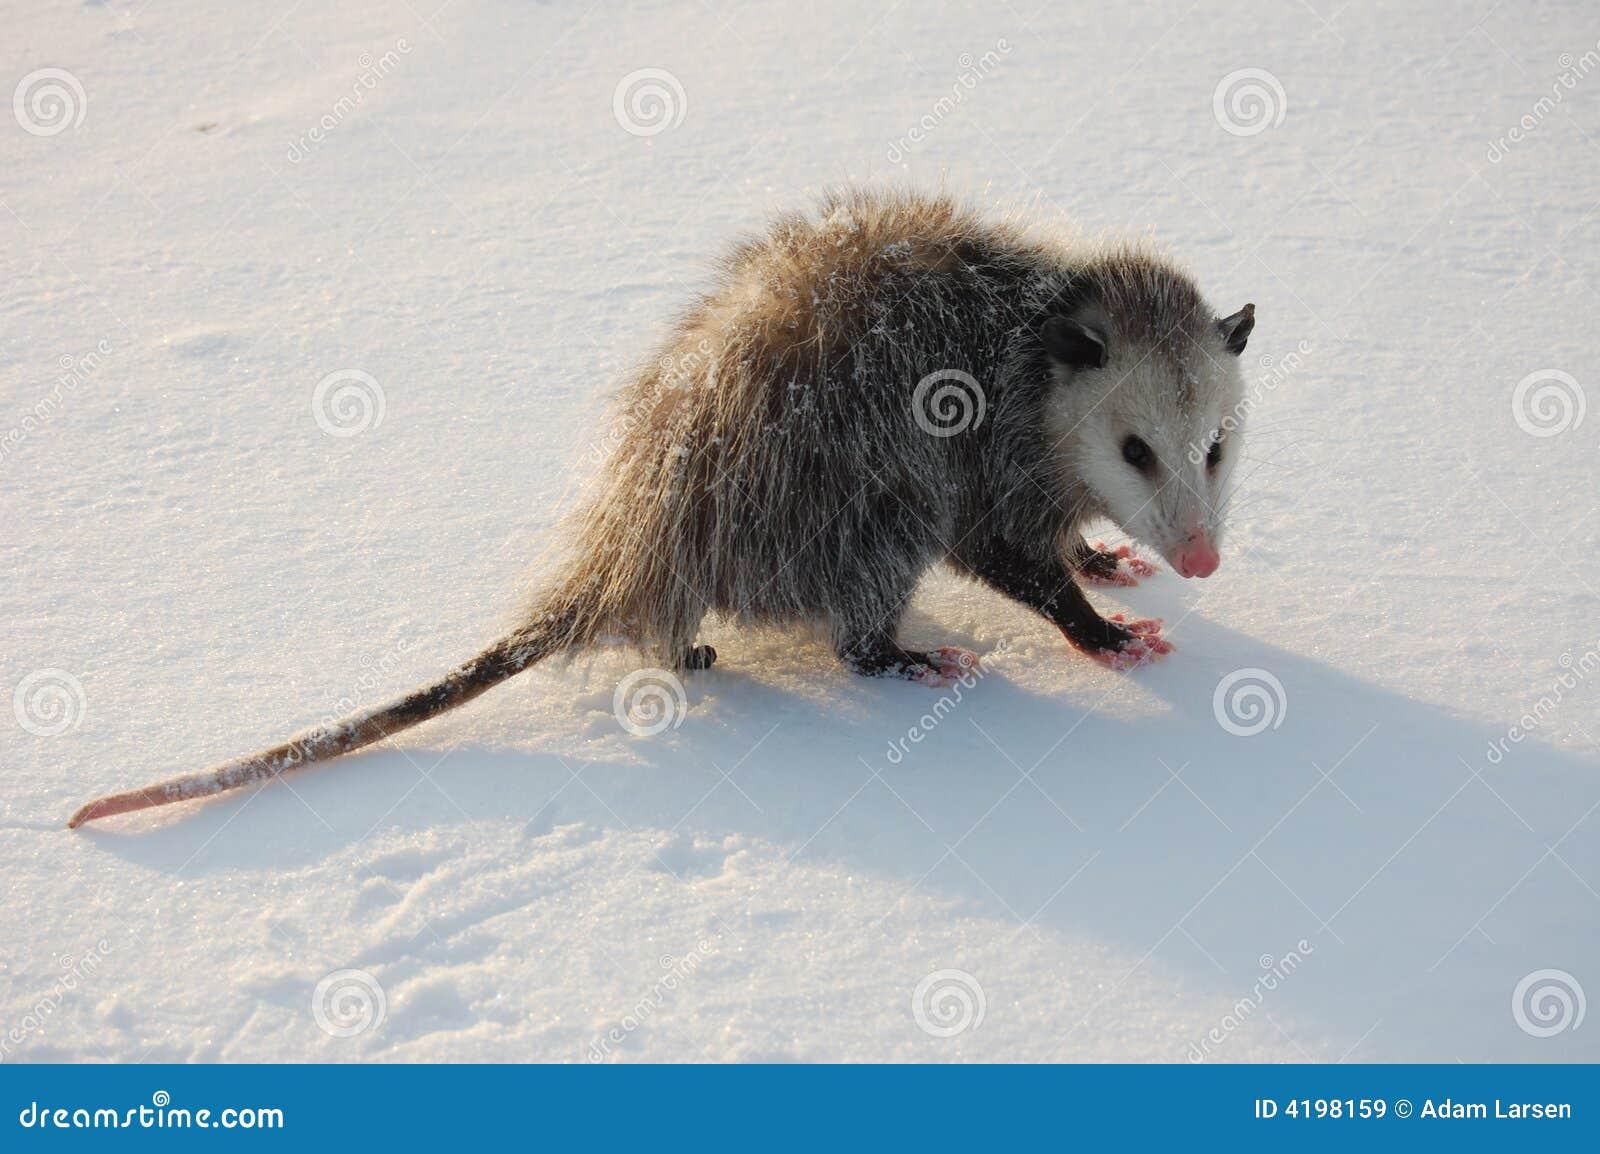 Opossum in the Snow stock image. Image of grayish, grey ...